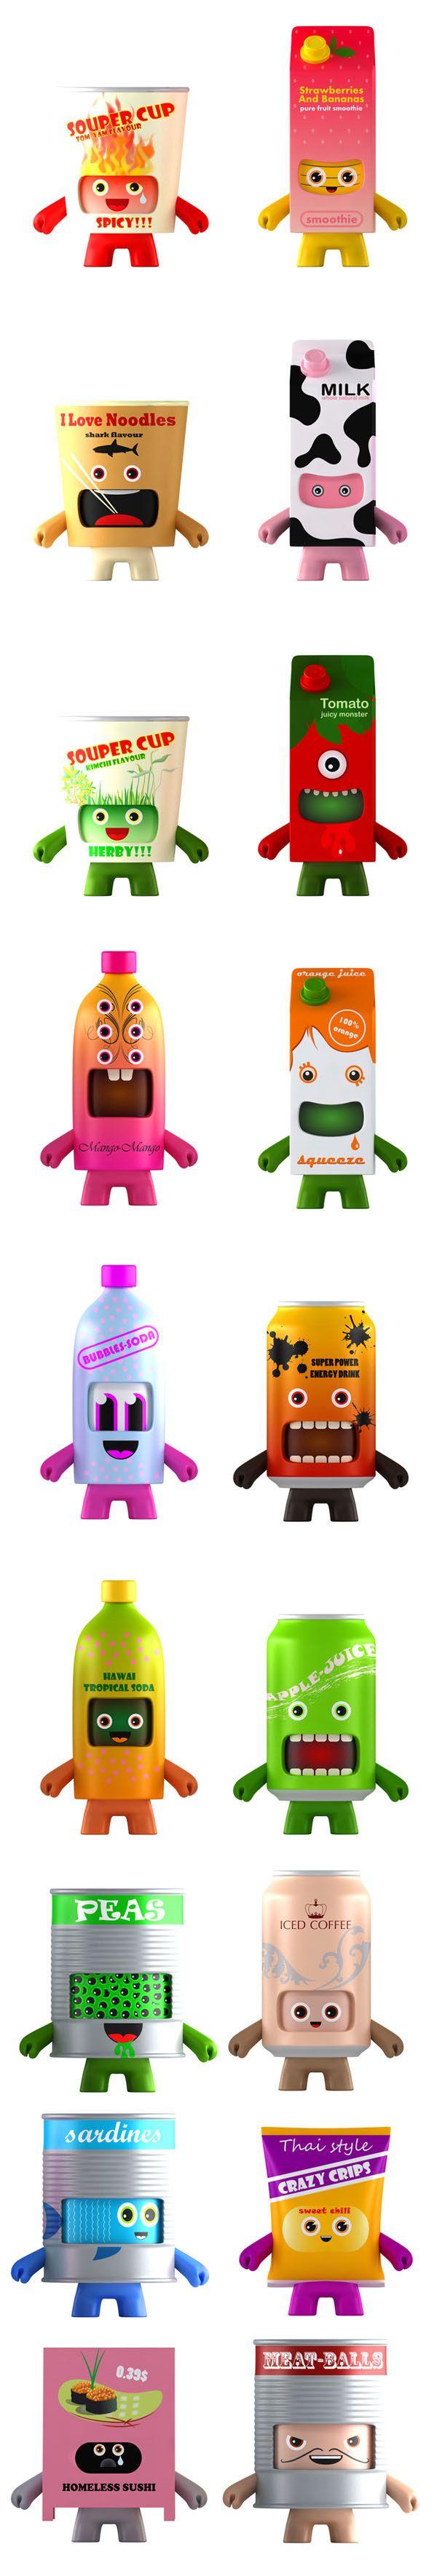 TOYS ADKITS on Toy Design Served